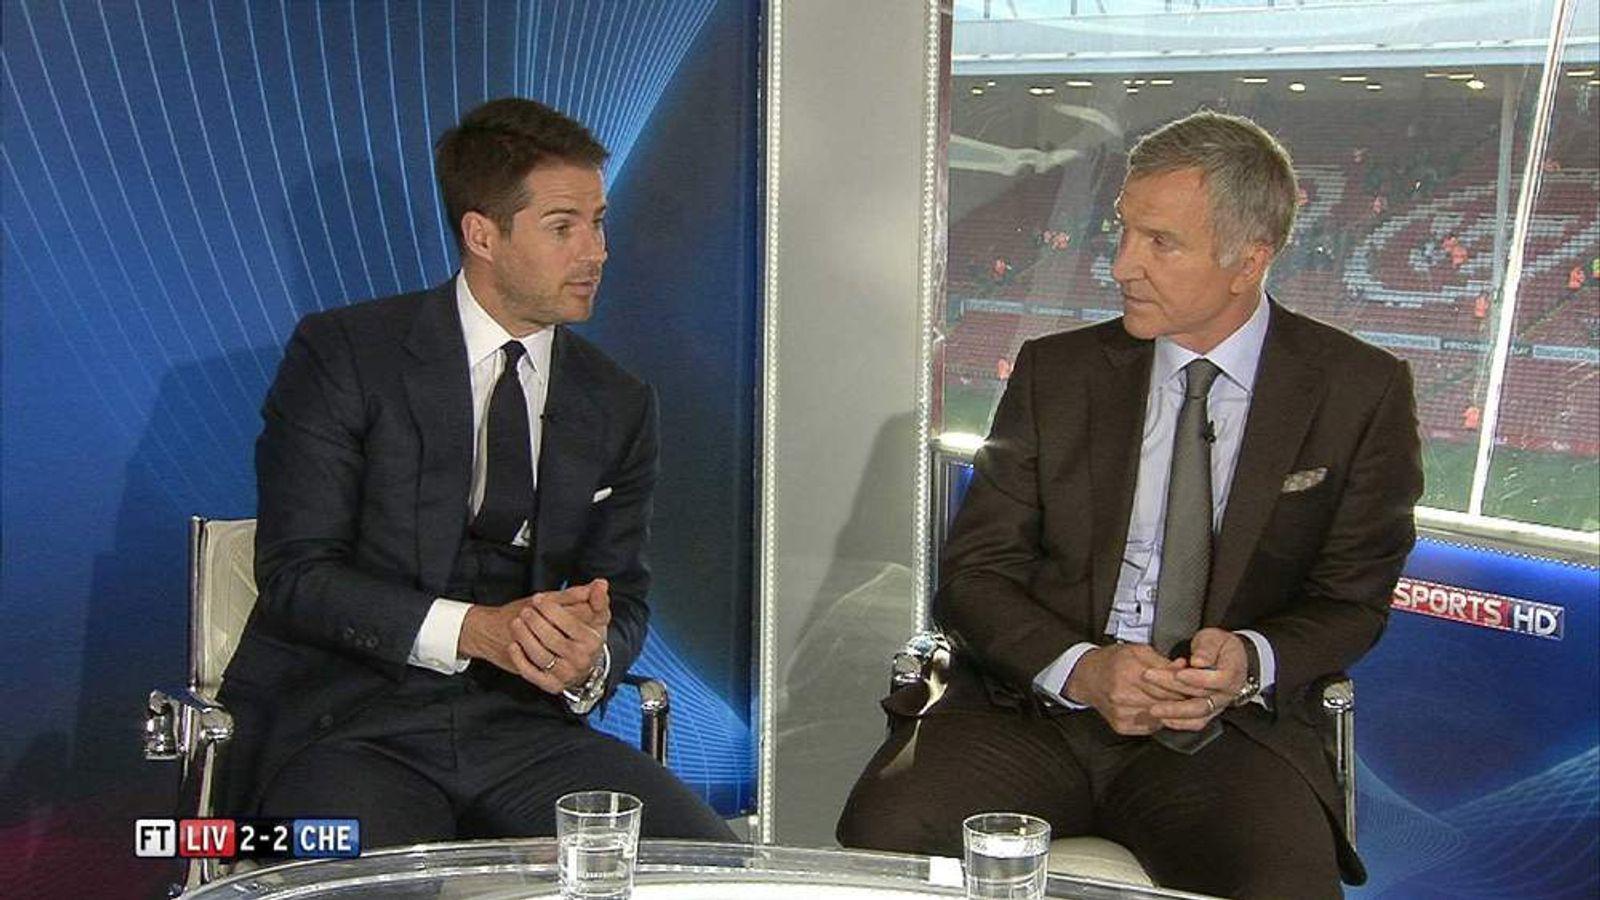 Jamie Redknapp and Graeme Souness